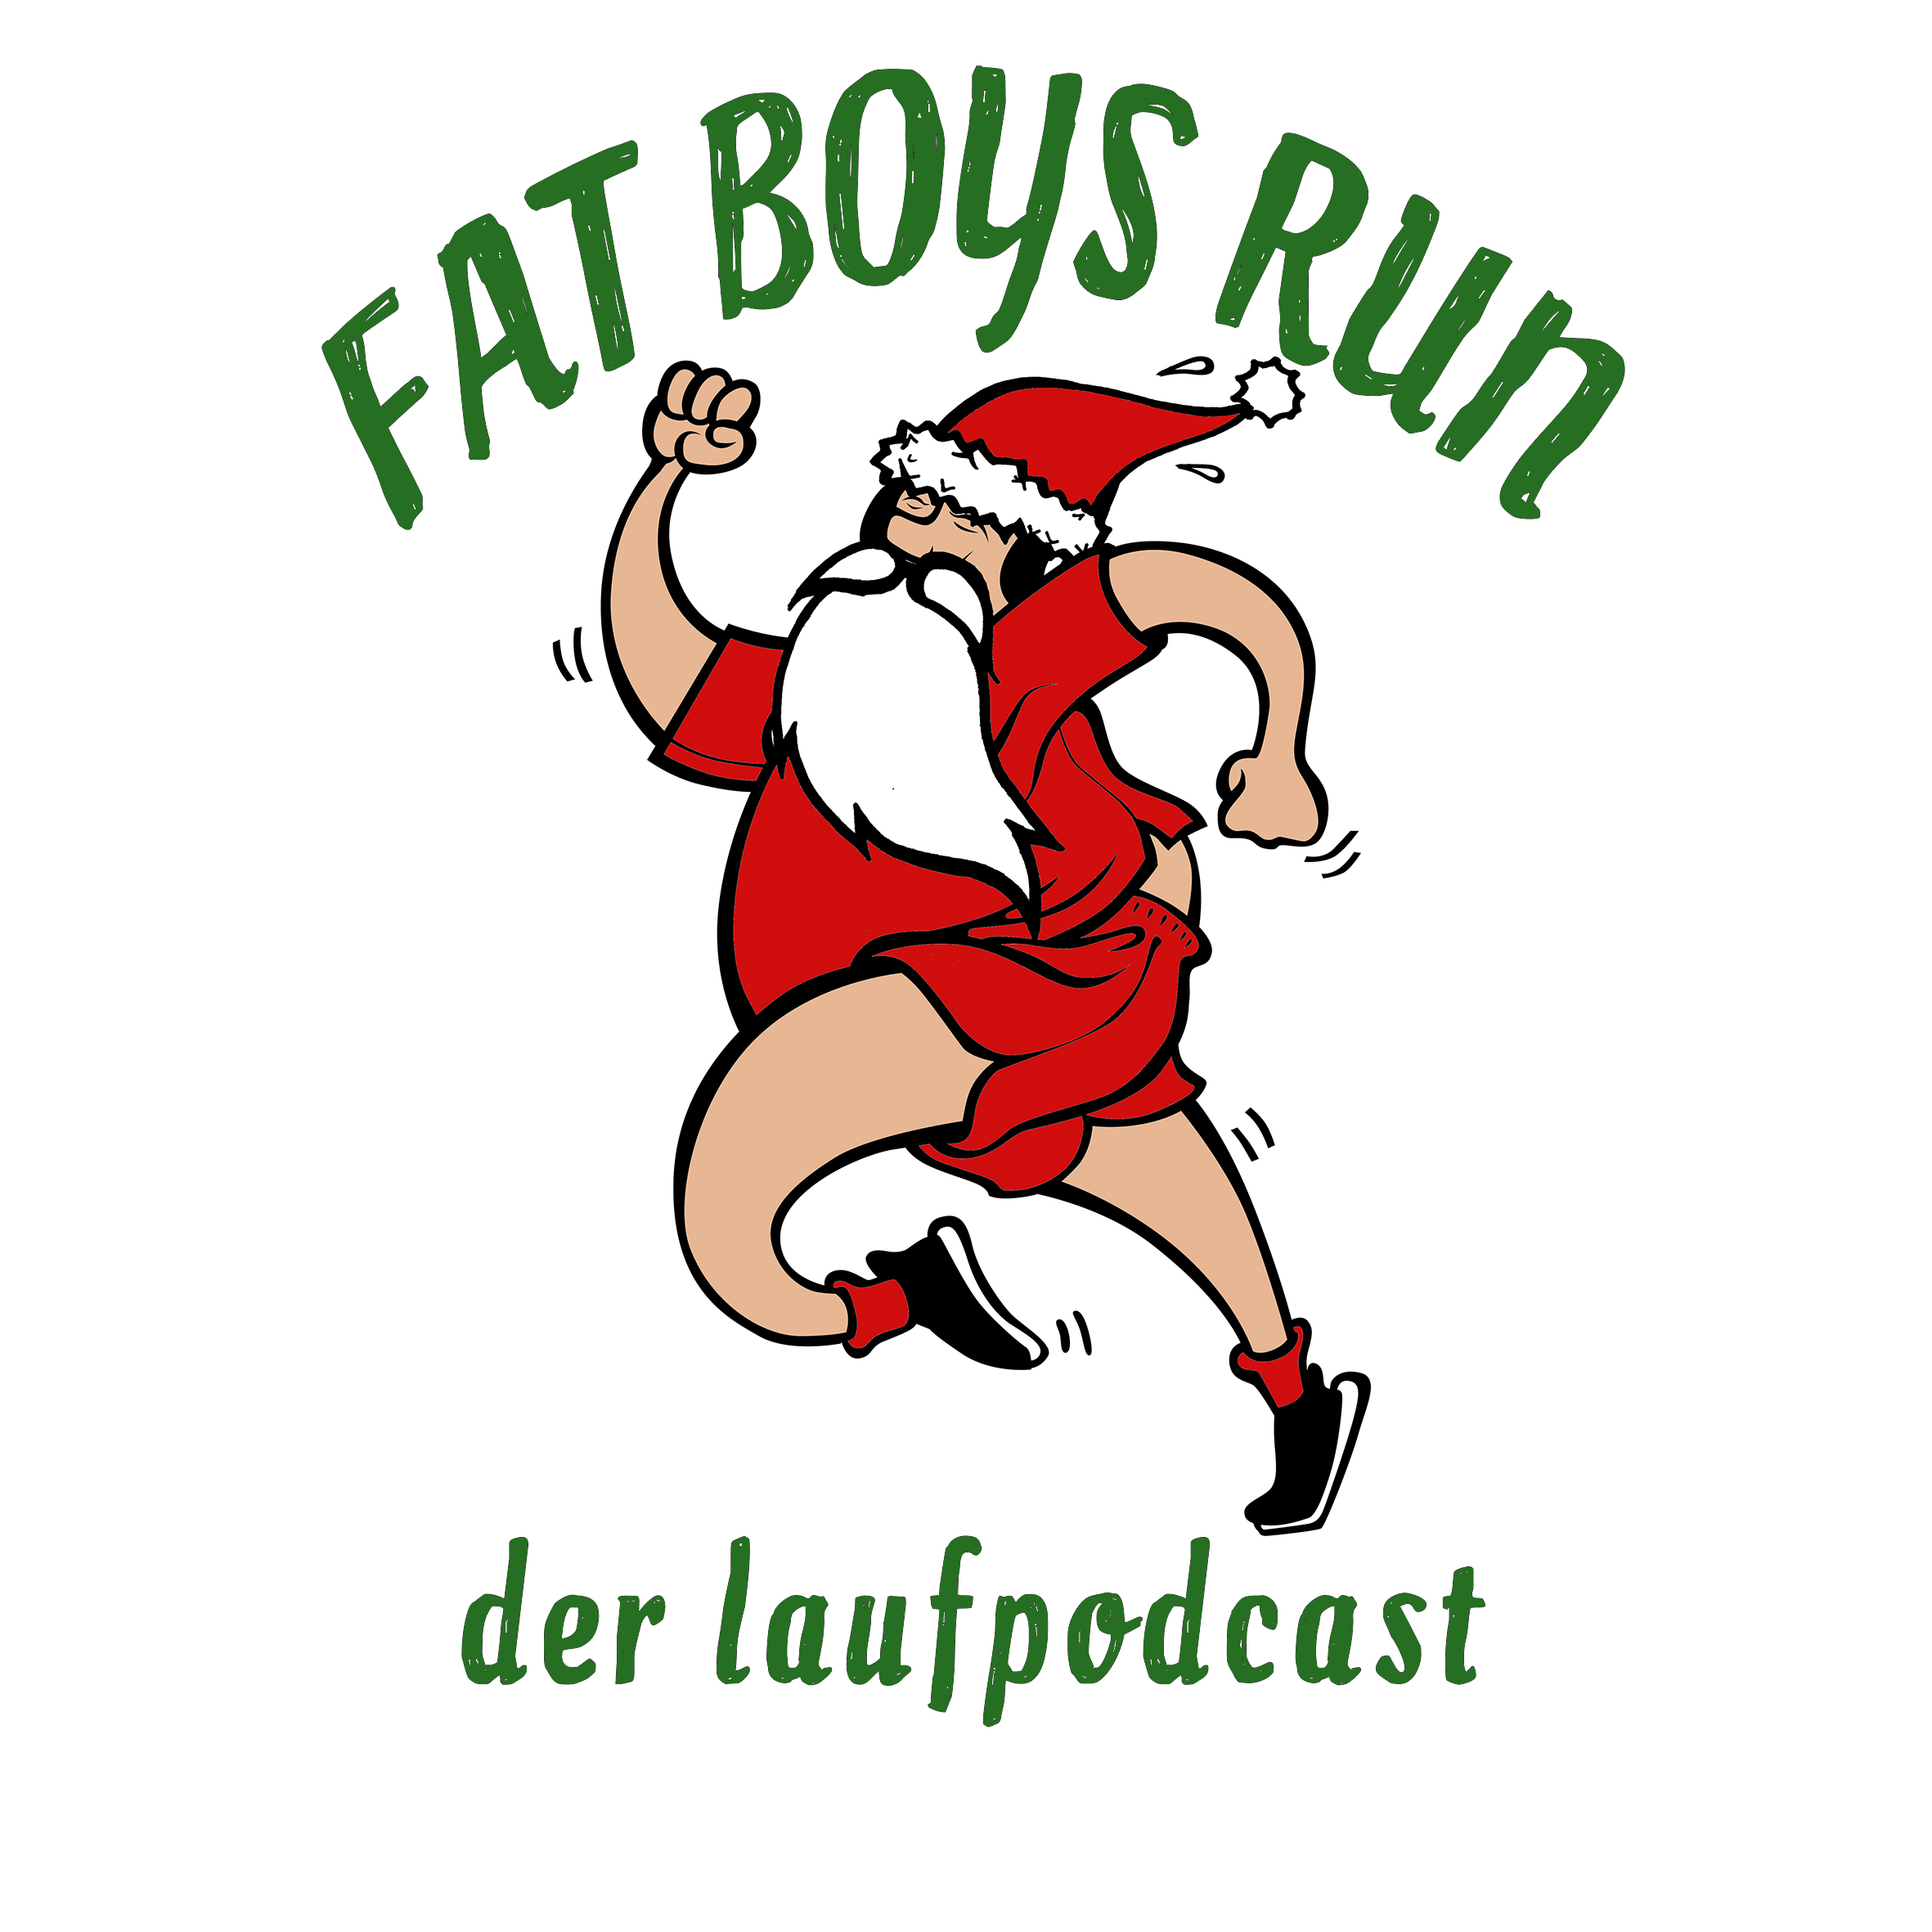 FatBoysRun Episode 70 – 2016 ein Rückblick